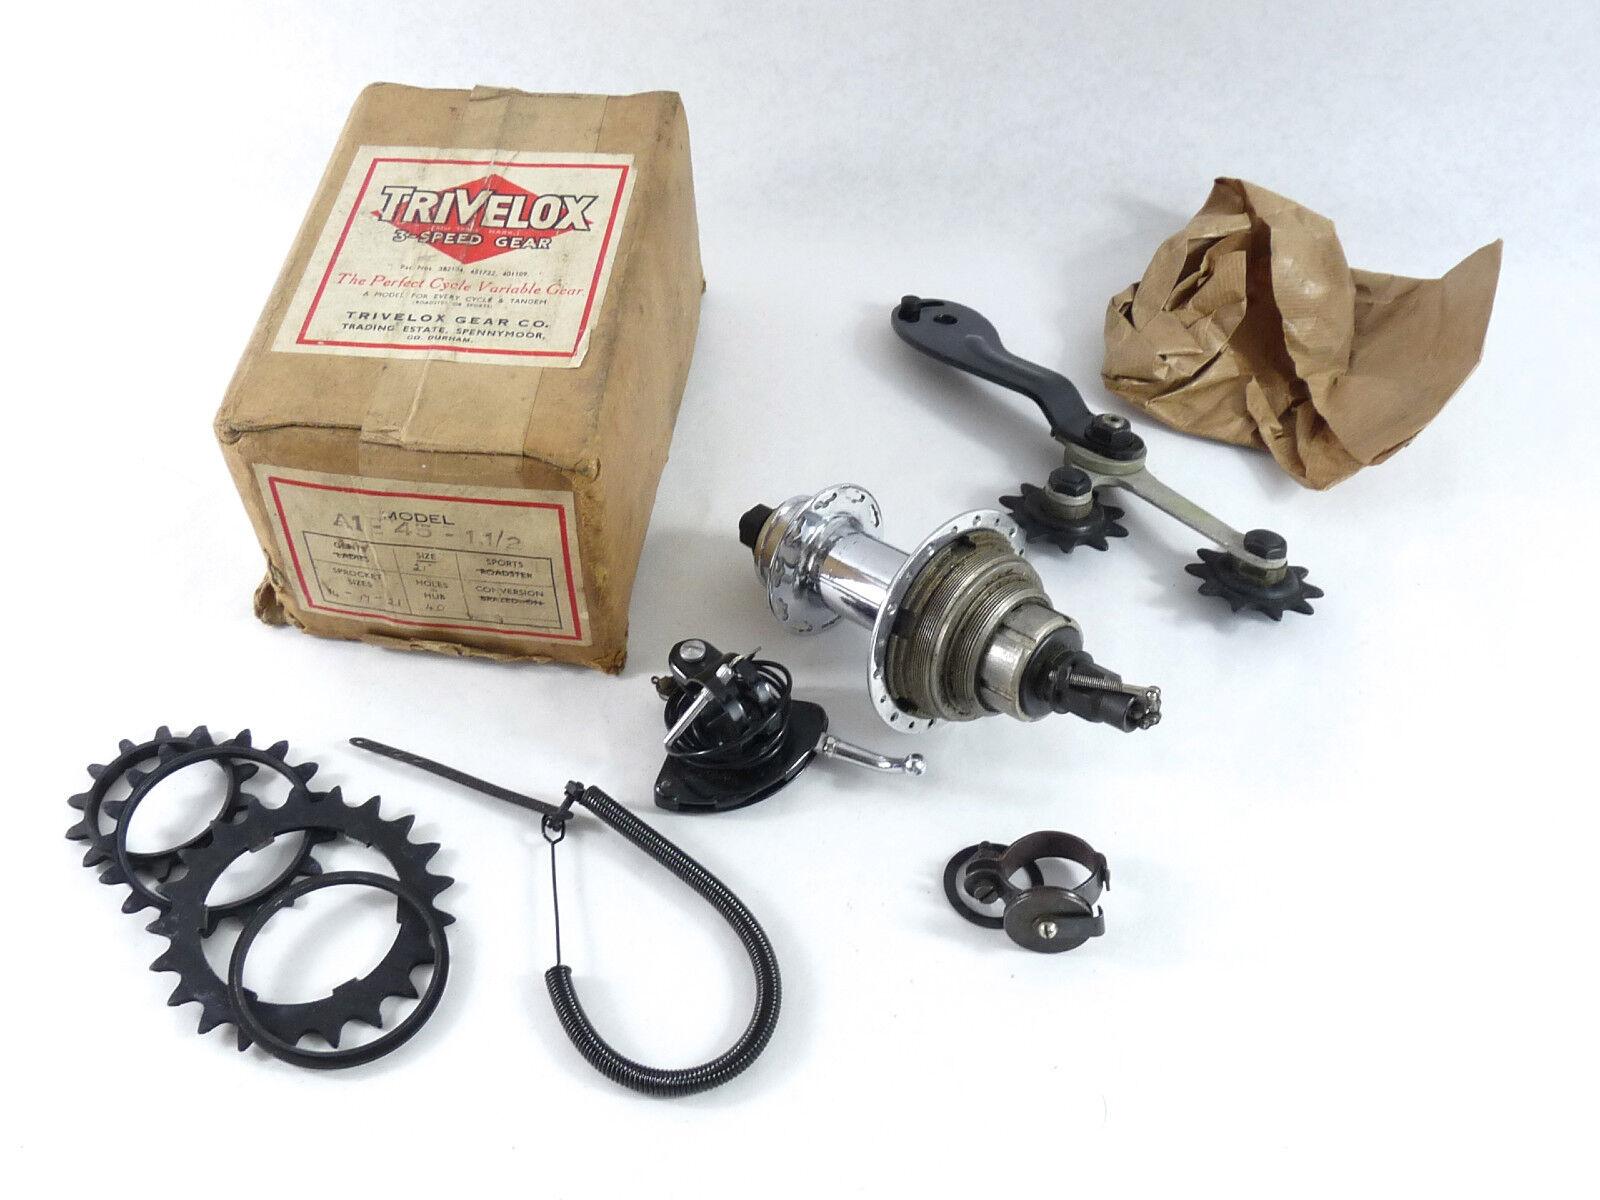 Trivelox Hub & Derailleur Kit 3 speed Model A 1930-40's Vintage Road Bike NOS